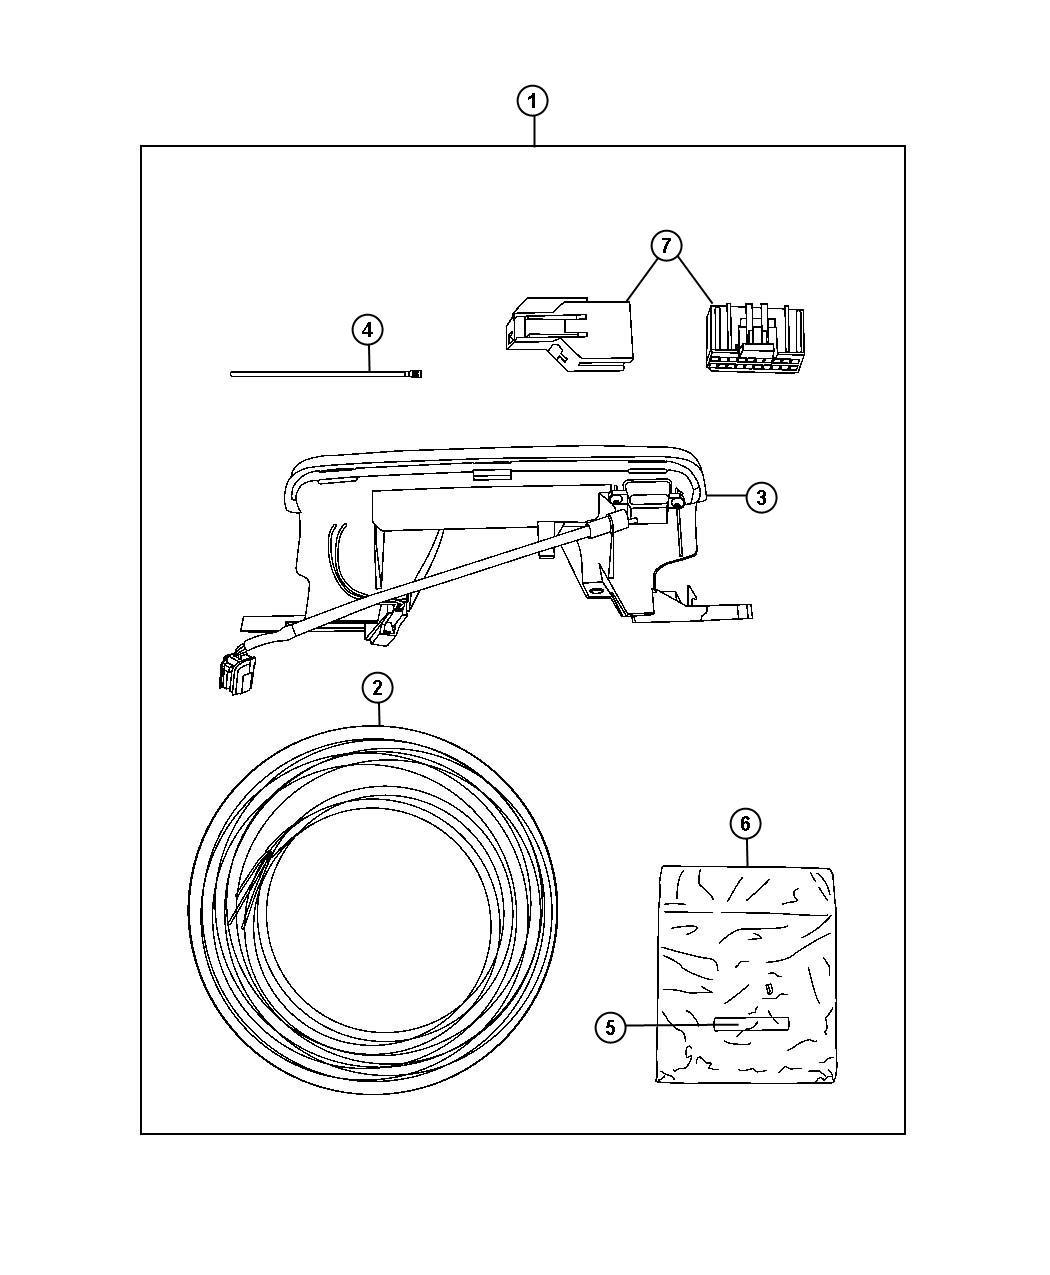 2013 chrysler 200 wiring diagram for radio